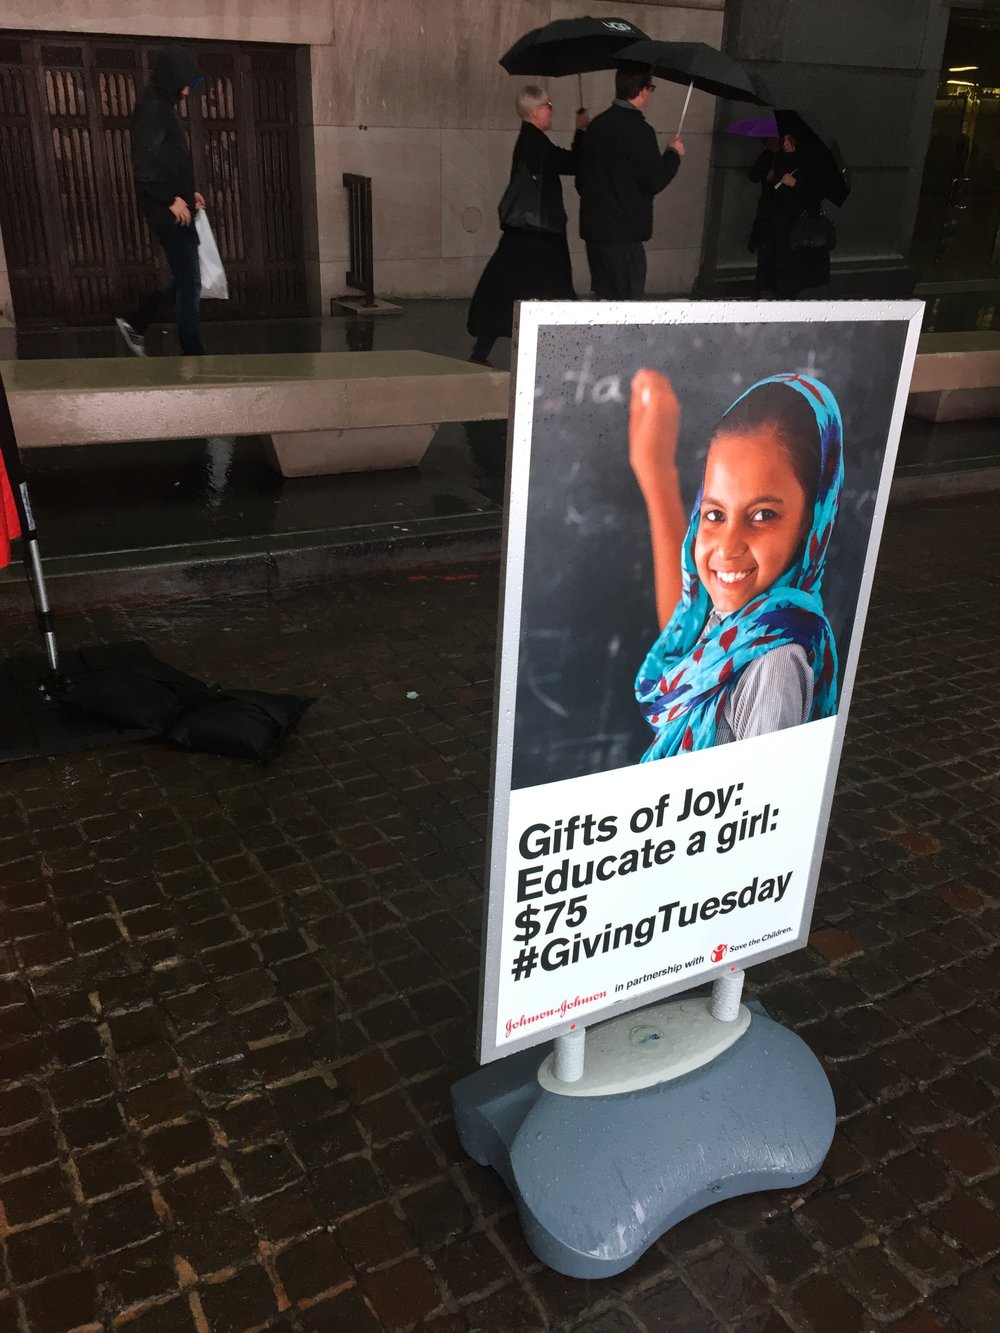 Proceeds benefit Save the Children